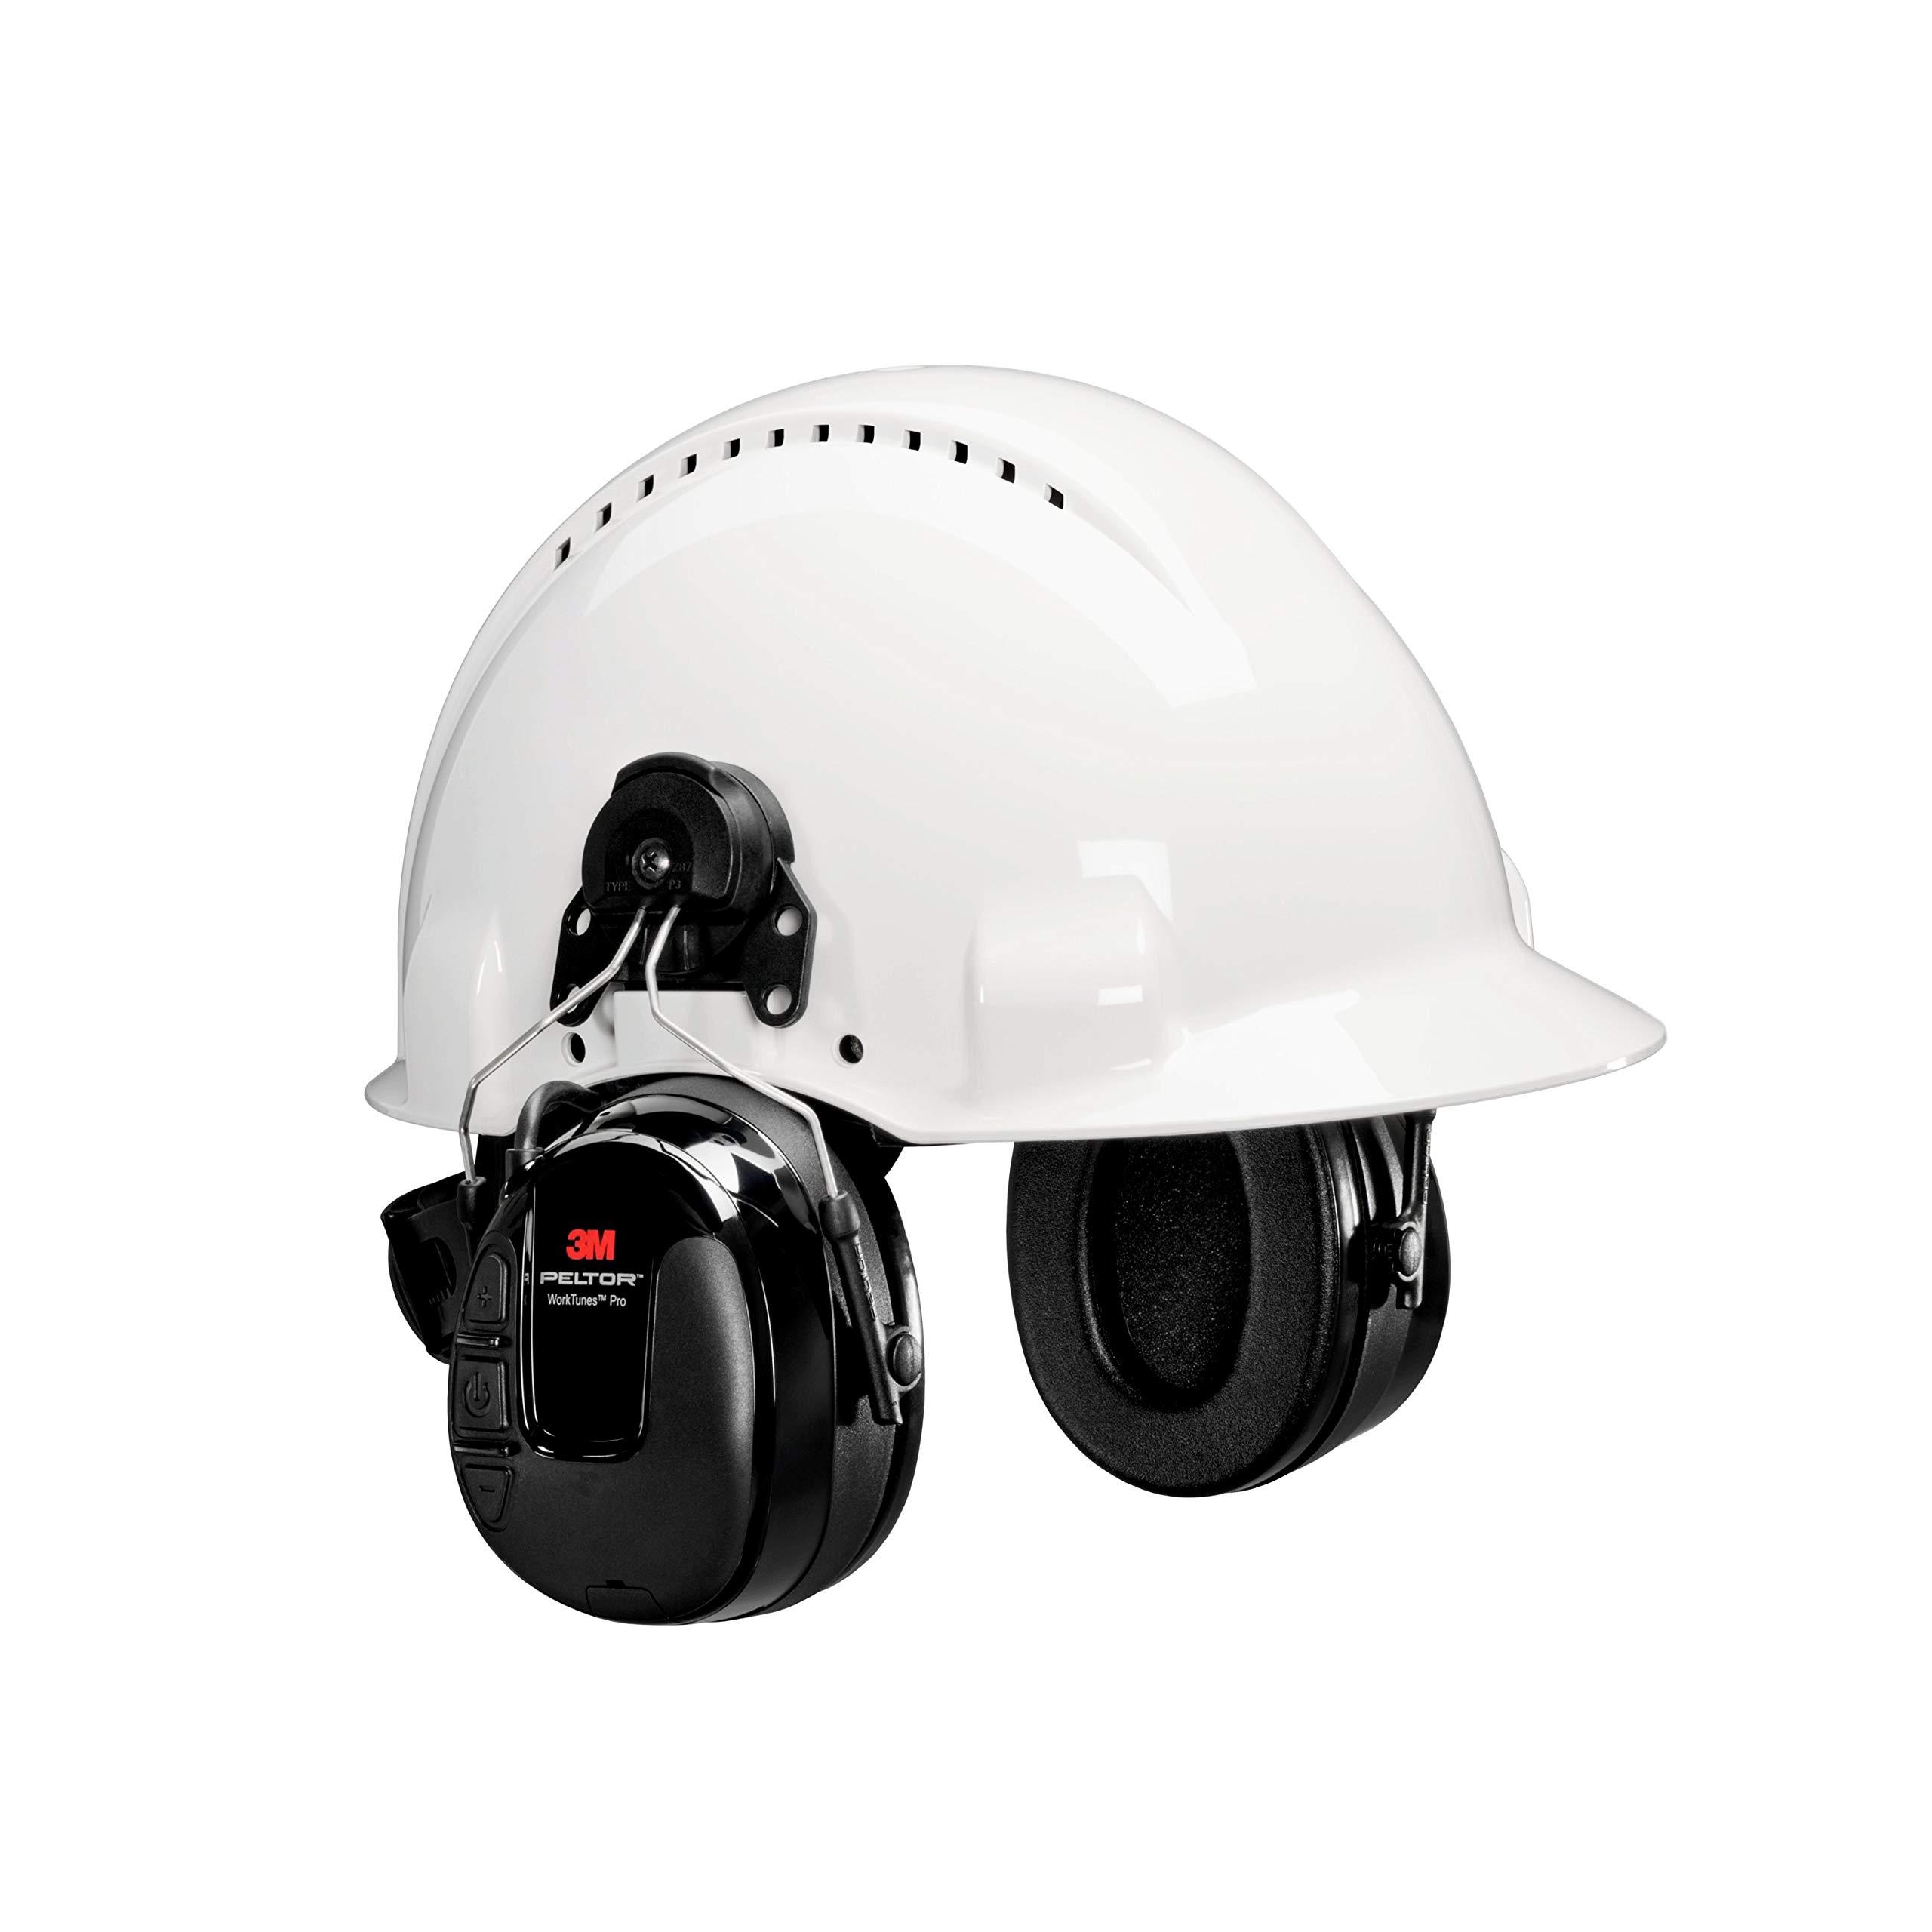 3M 00078371670887 Peltor Worktunes Pro Cap-Mounted Radio Headset, Capacity, Volume, Standard, Black by 3M